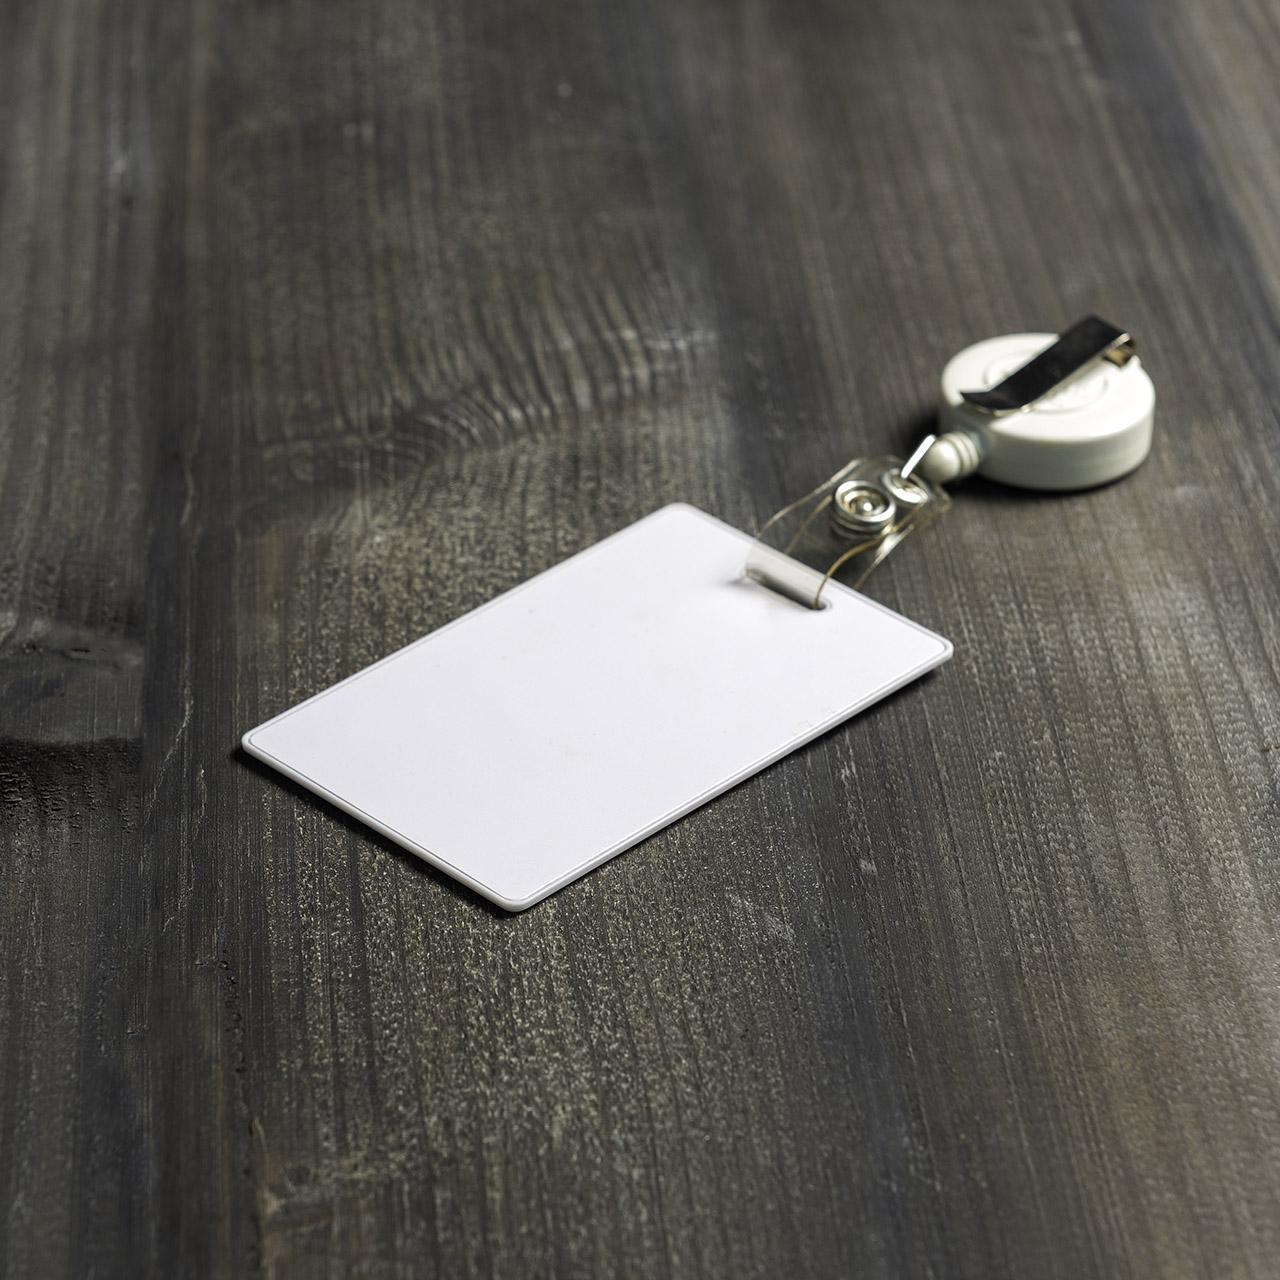 RFID card security